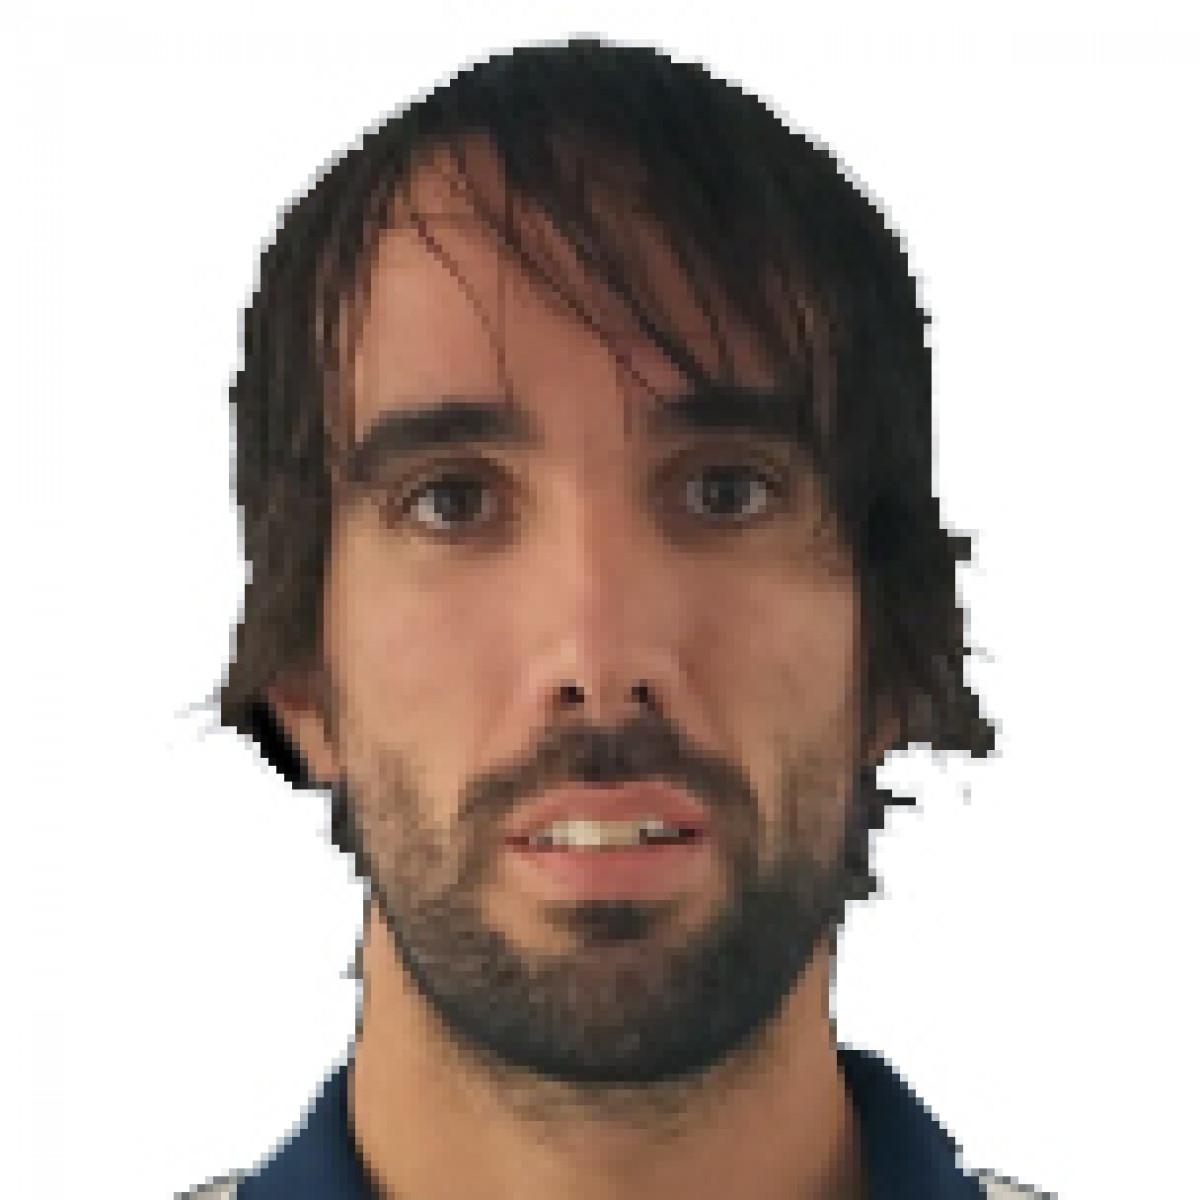 Jordi Grimau